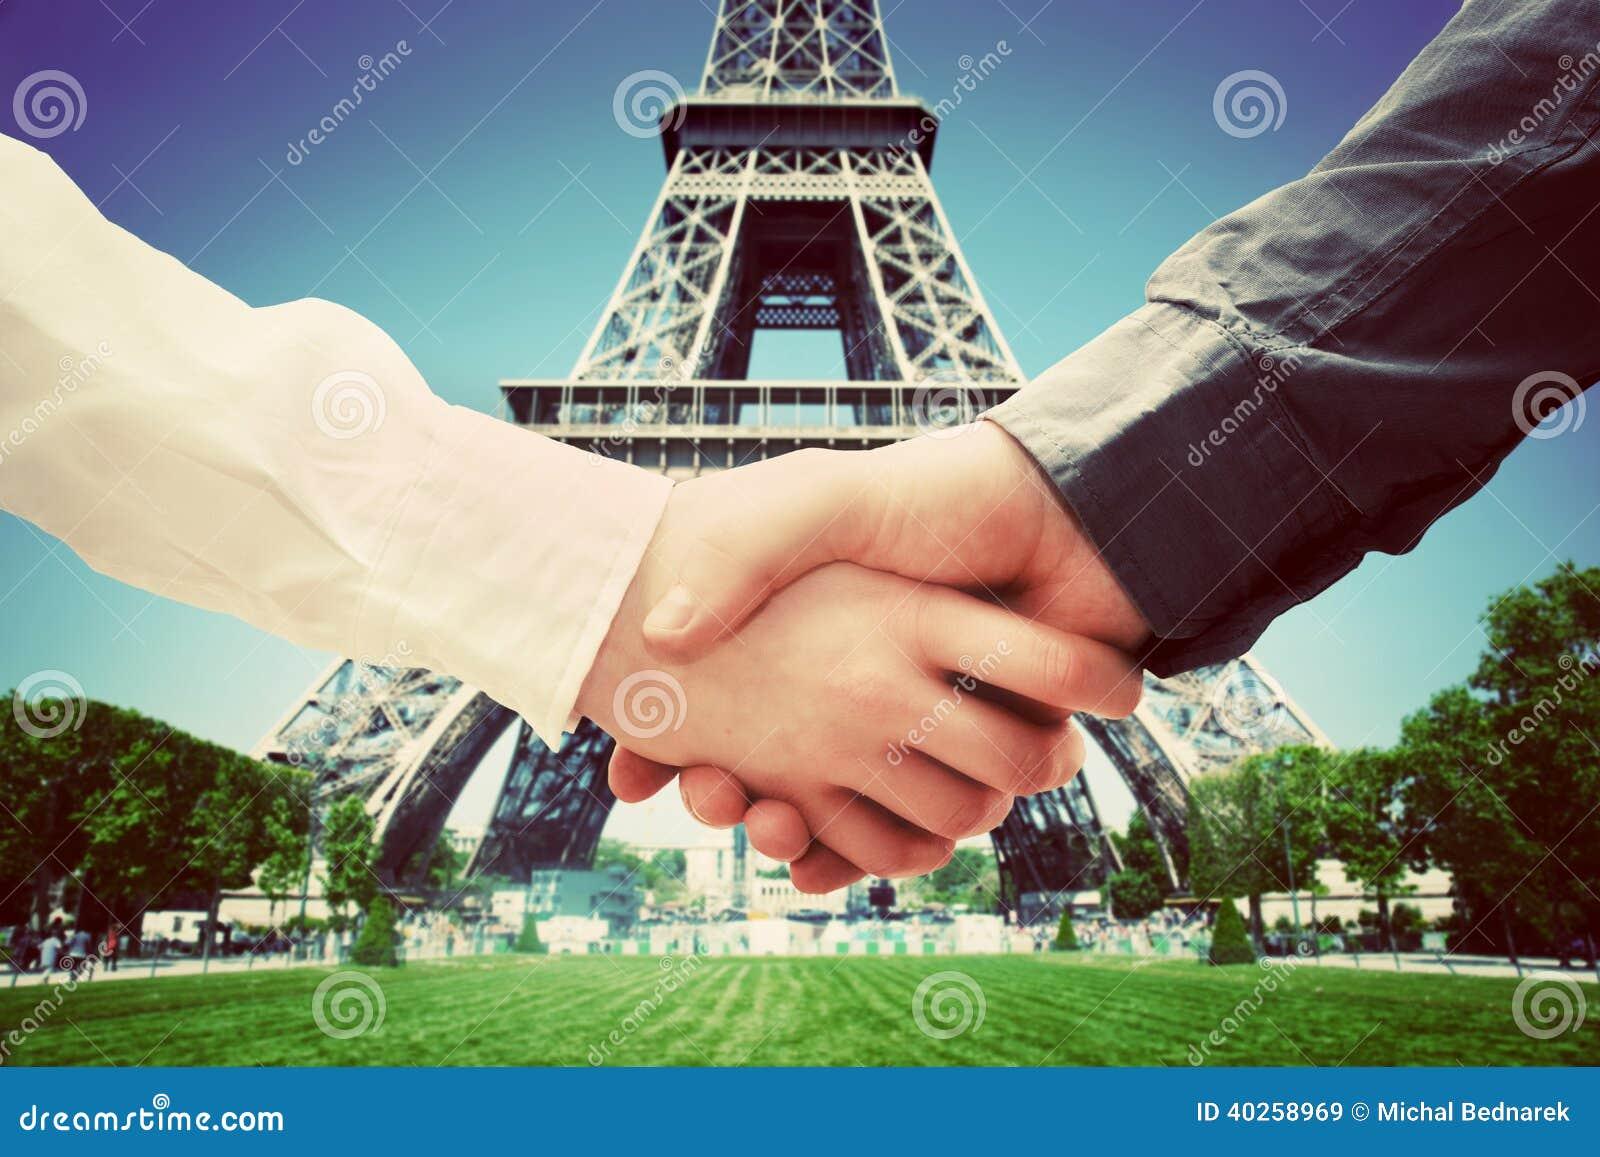 Business In Paris France Handshake Eiffel Tower